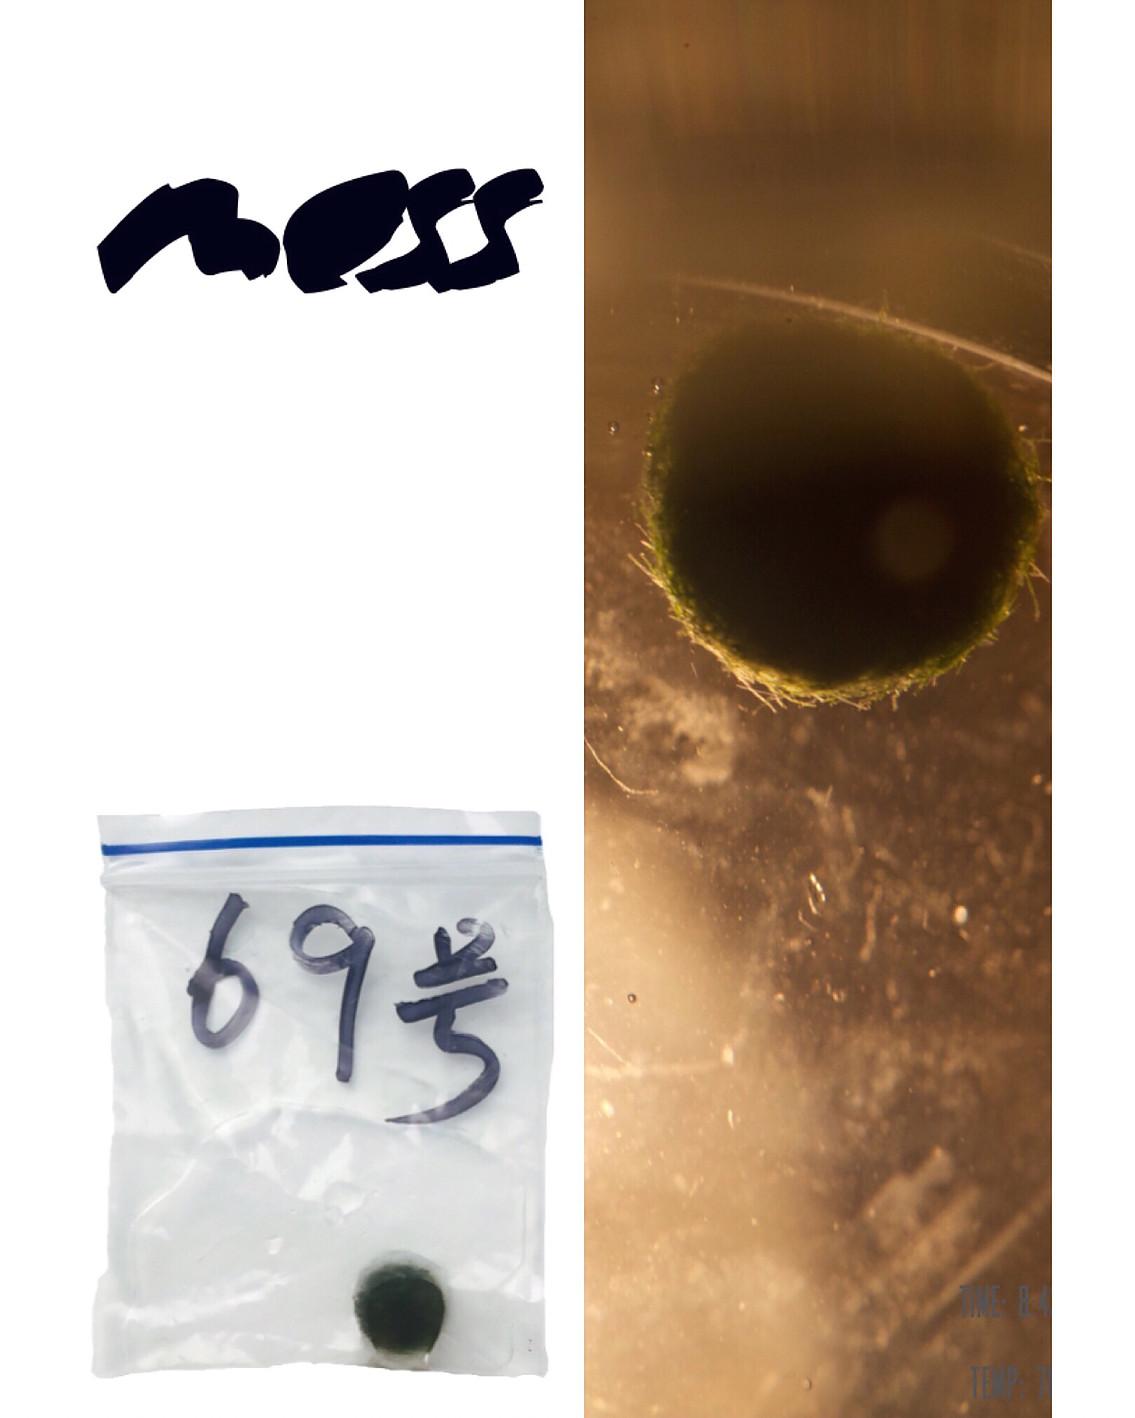 Moss zine